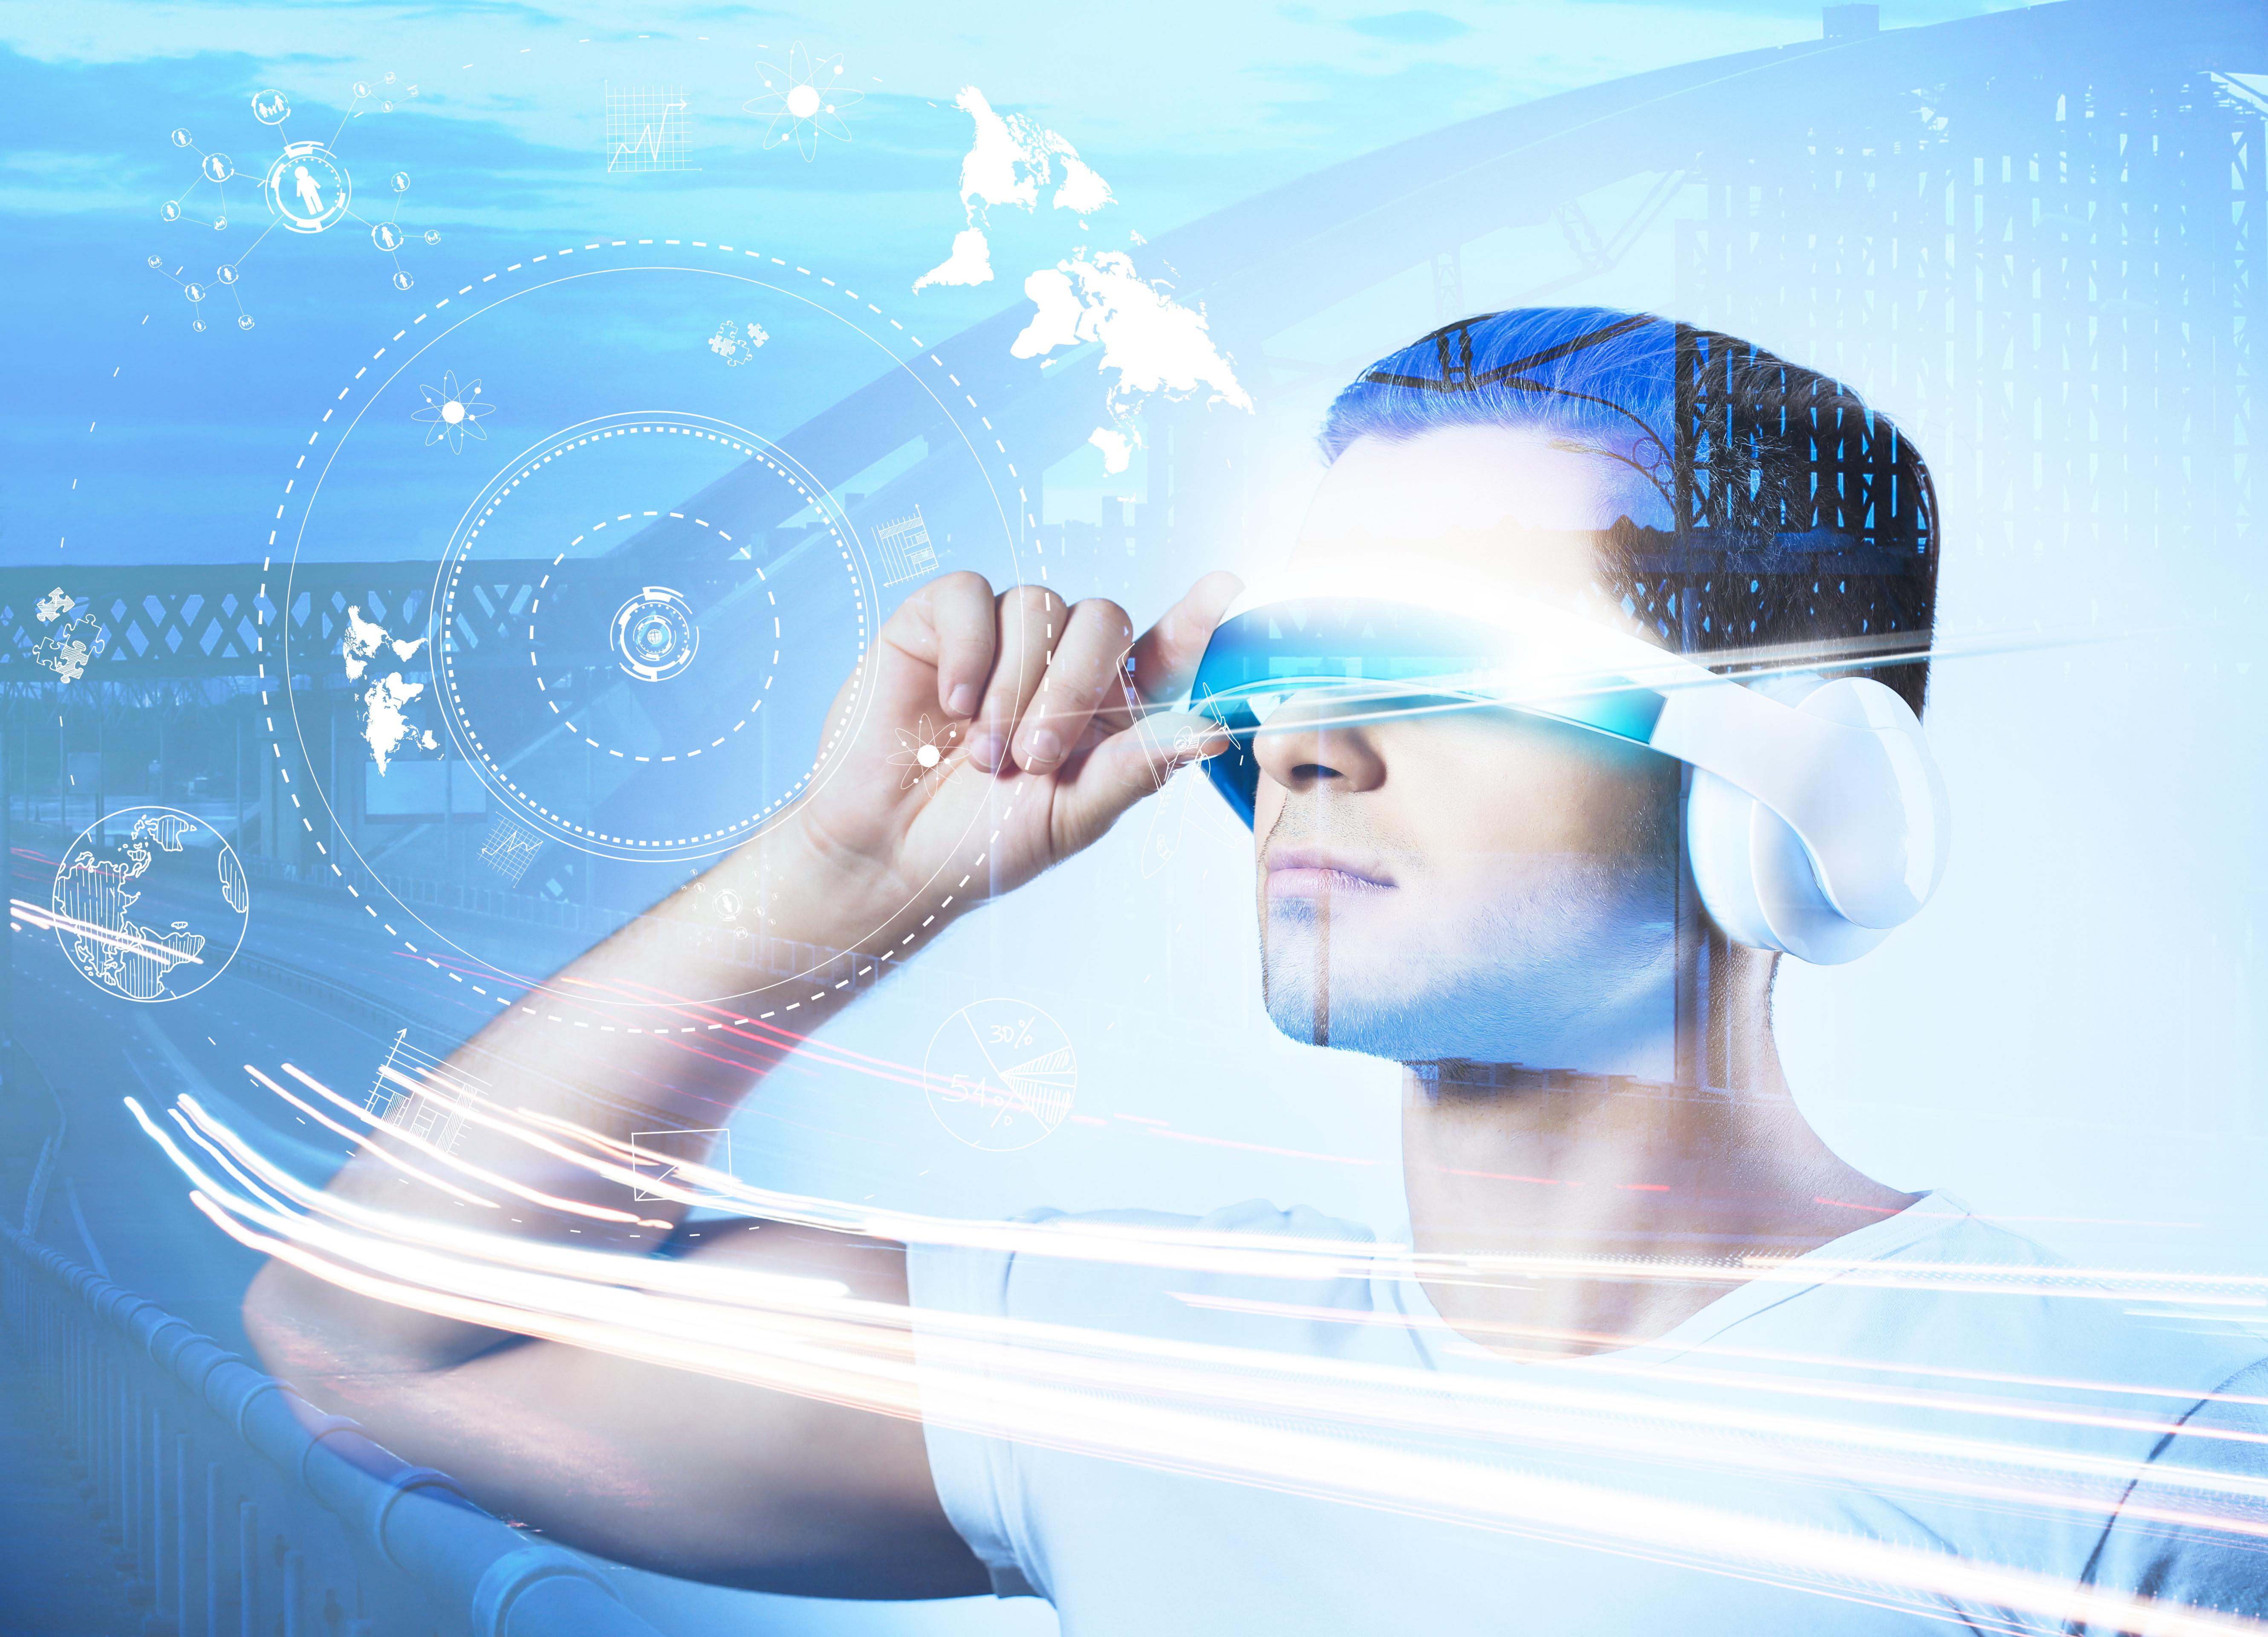 habilitador tecnológico: visión artificial